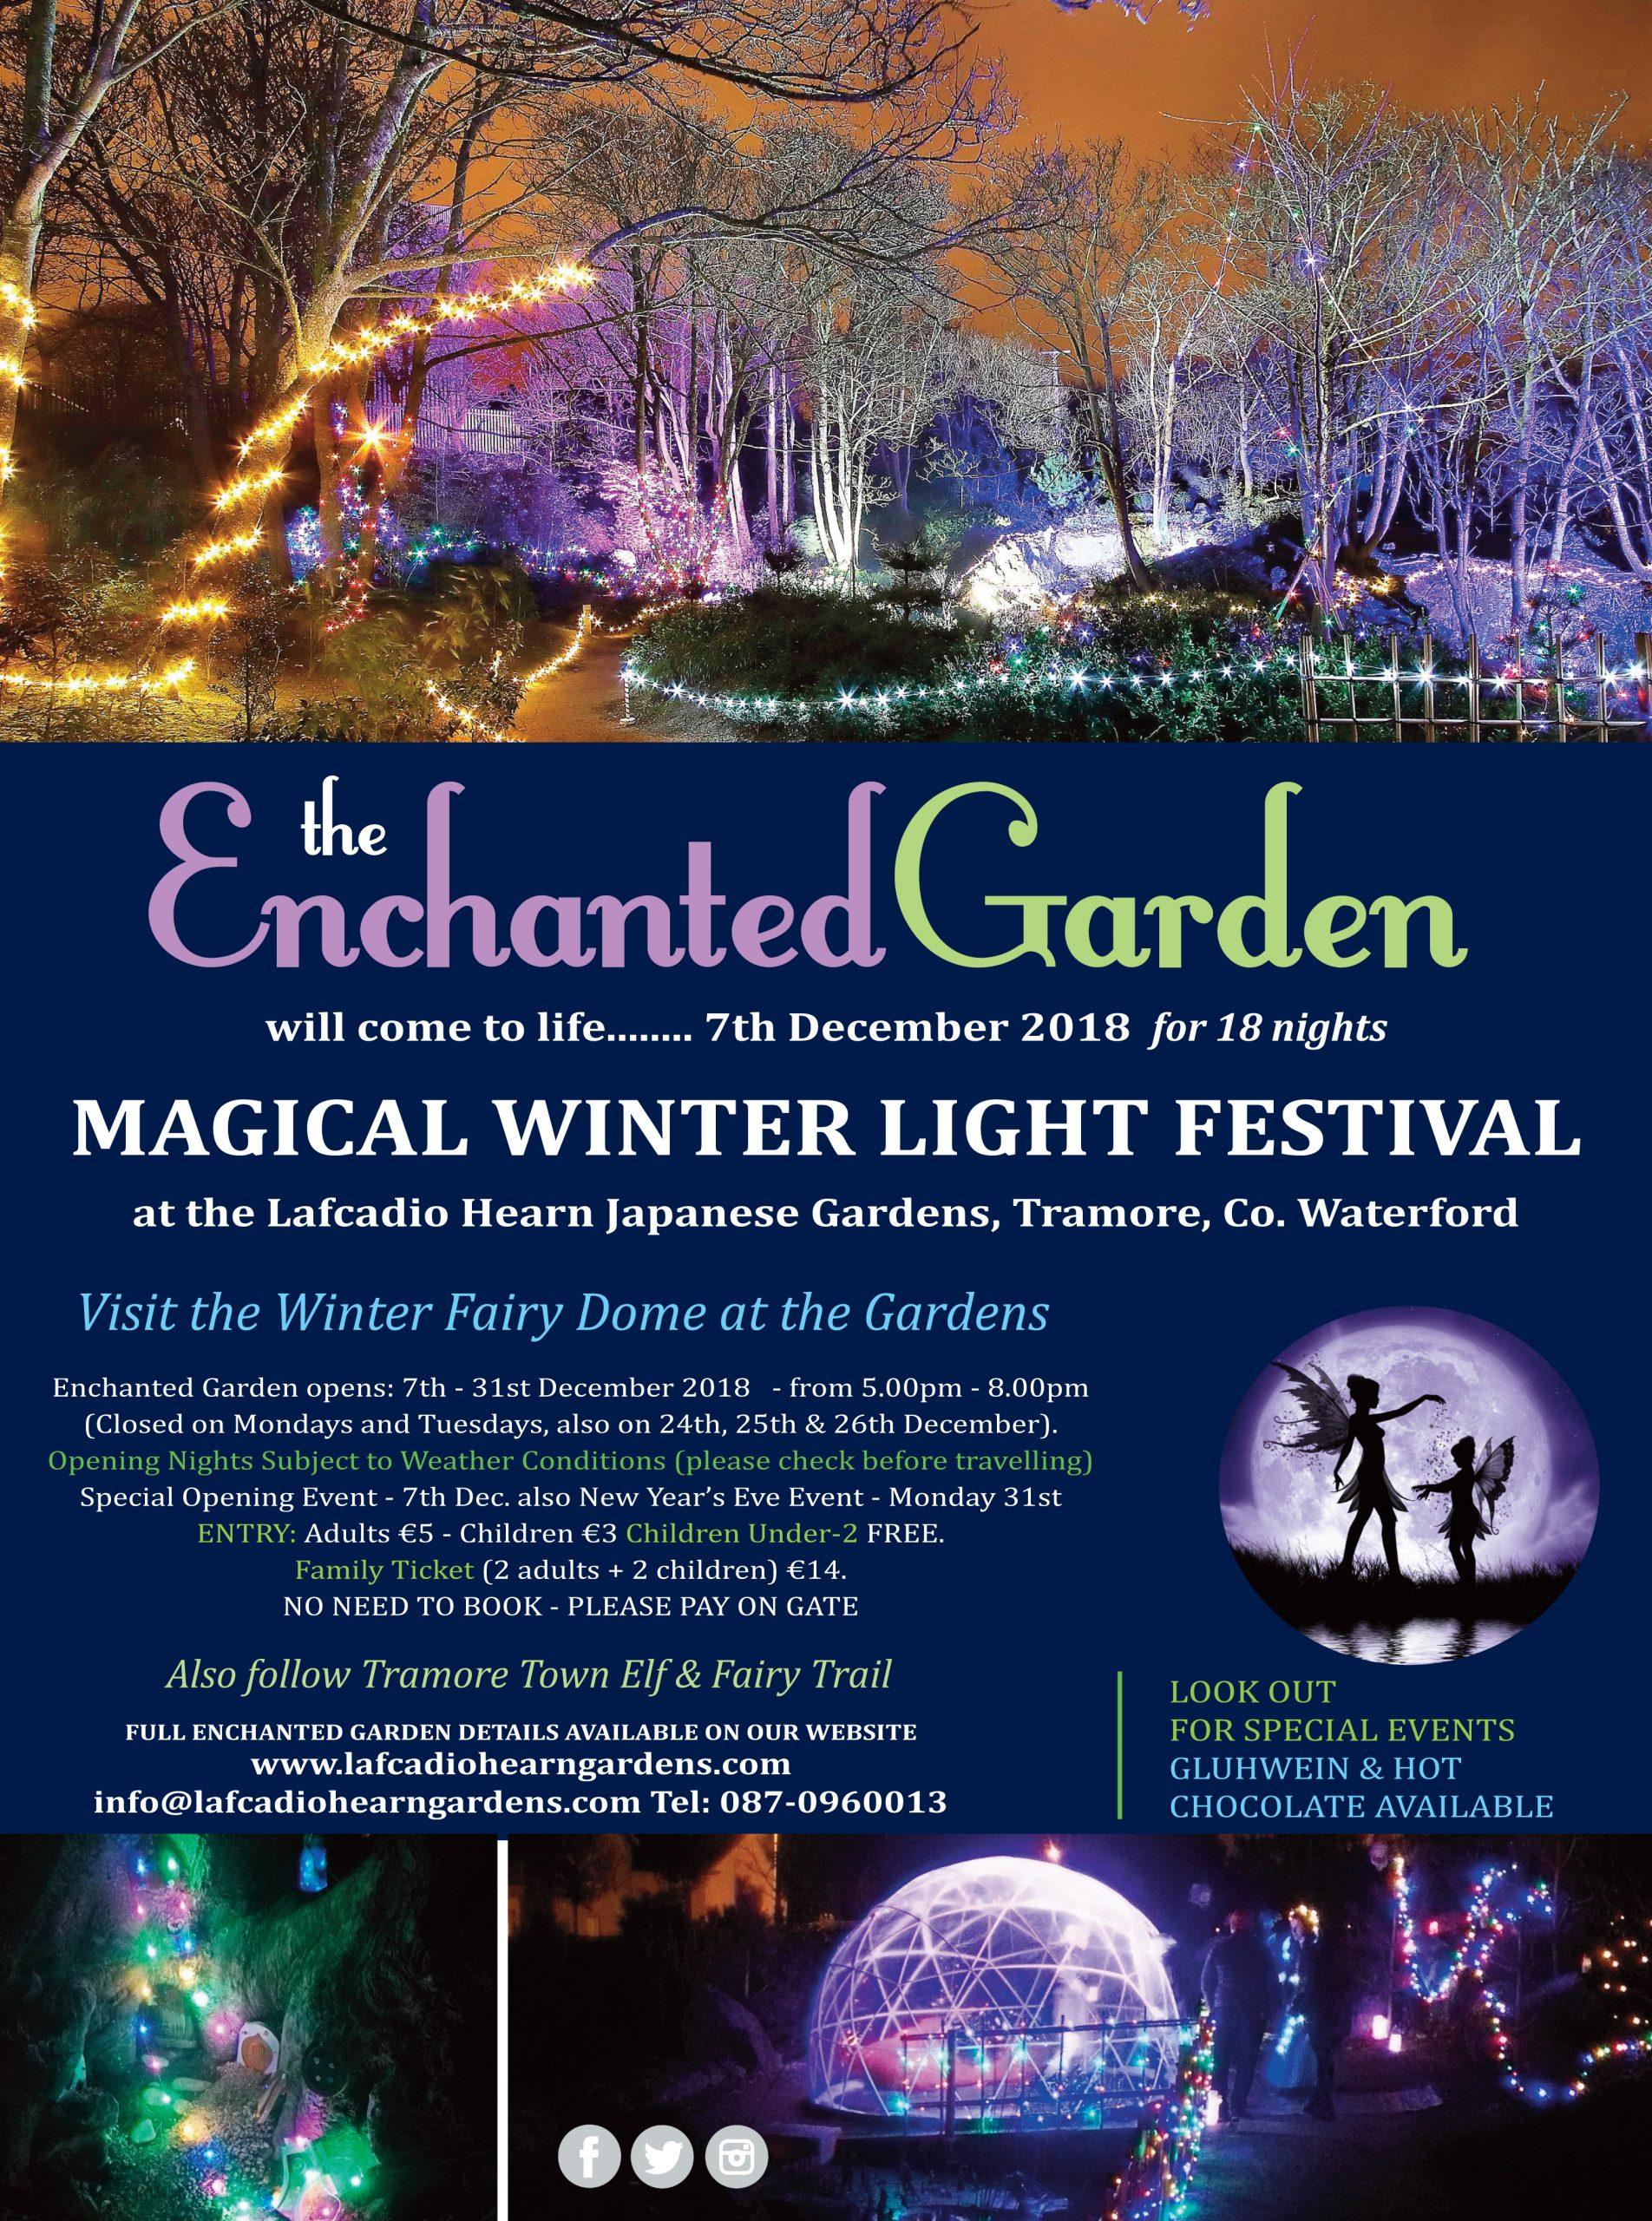 The Enchanted Garden - December 7th - 31st